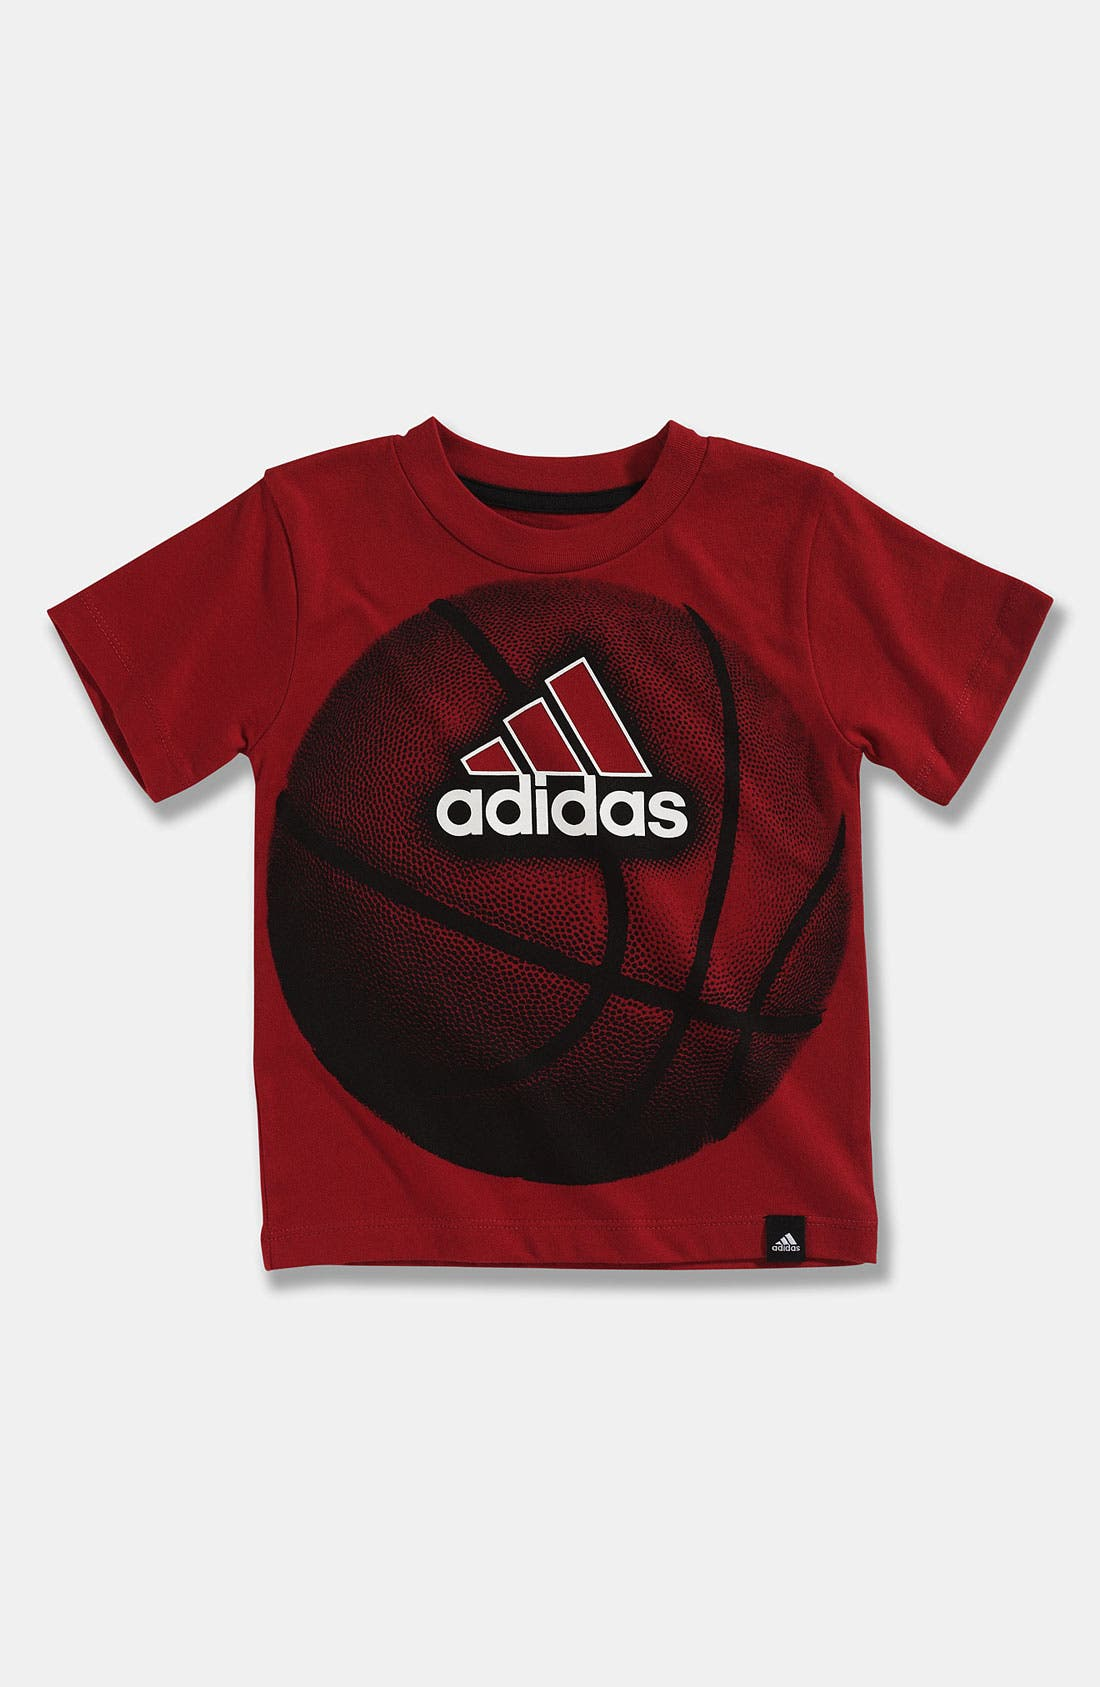 Alternate Image 1 Selected - adidas 'Big Ball' T-Shirt (Toddler)